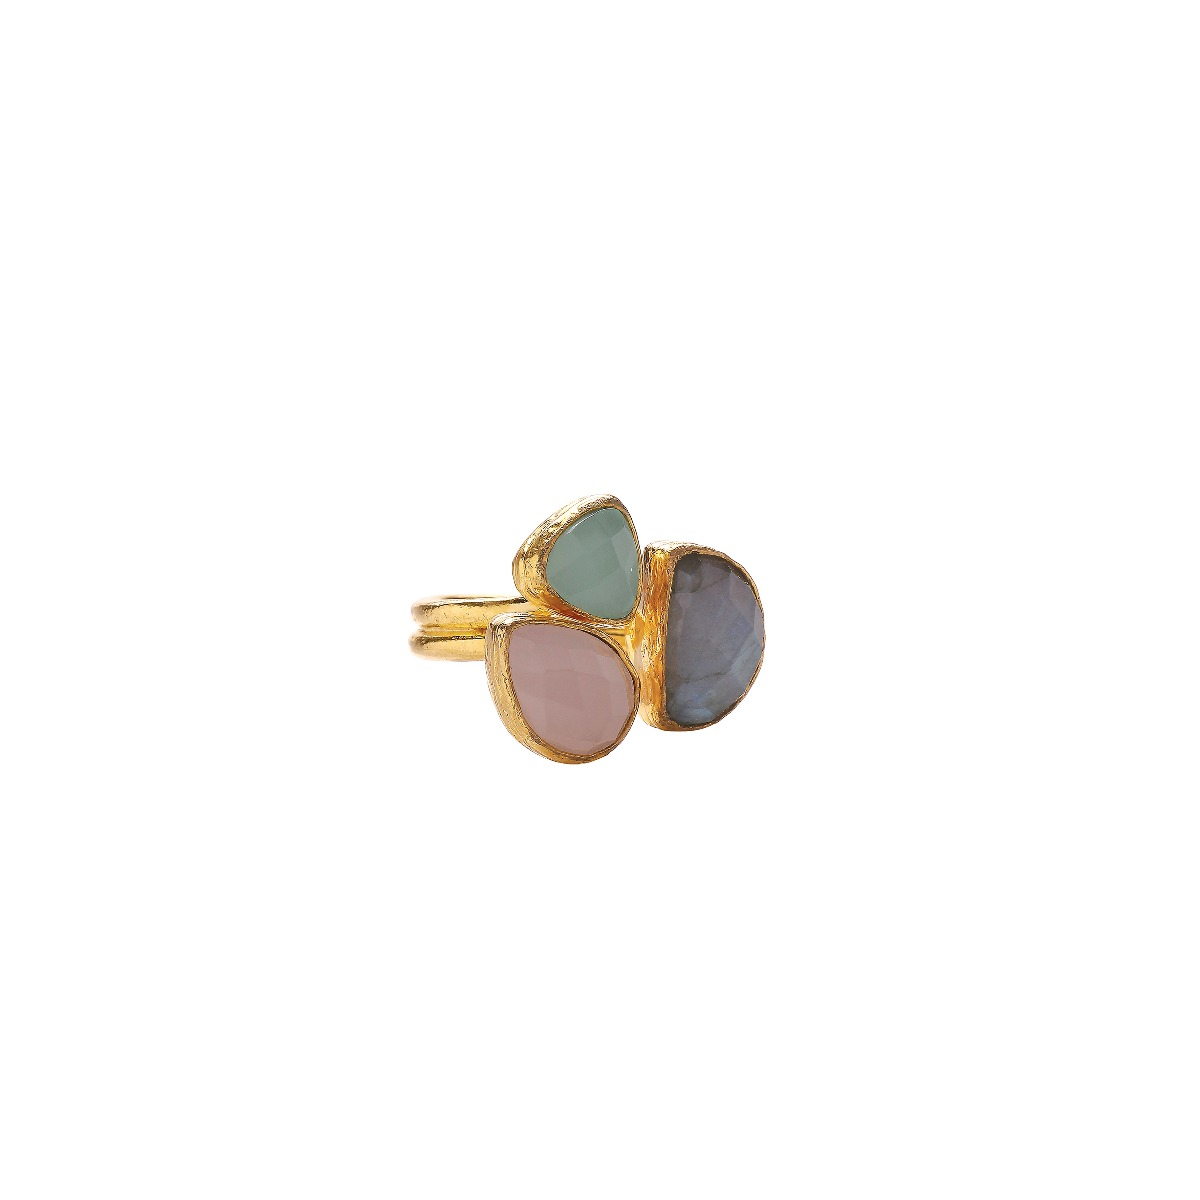 Rose quartz, chalcedony and labradorite ring